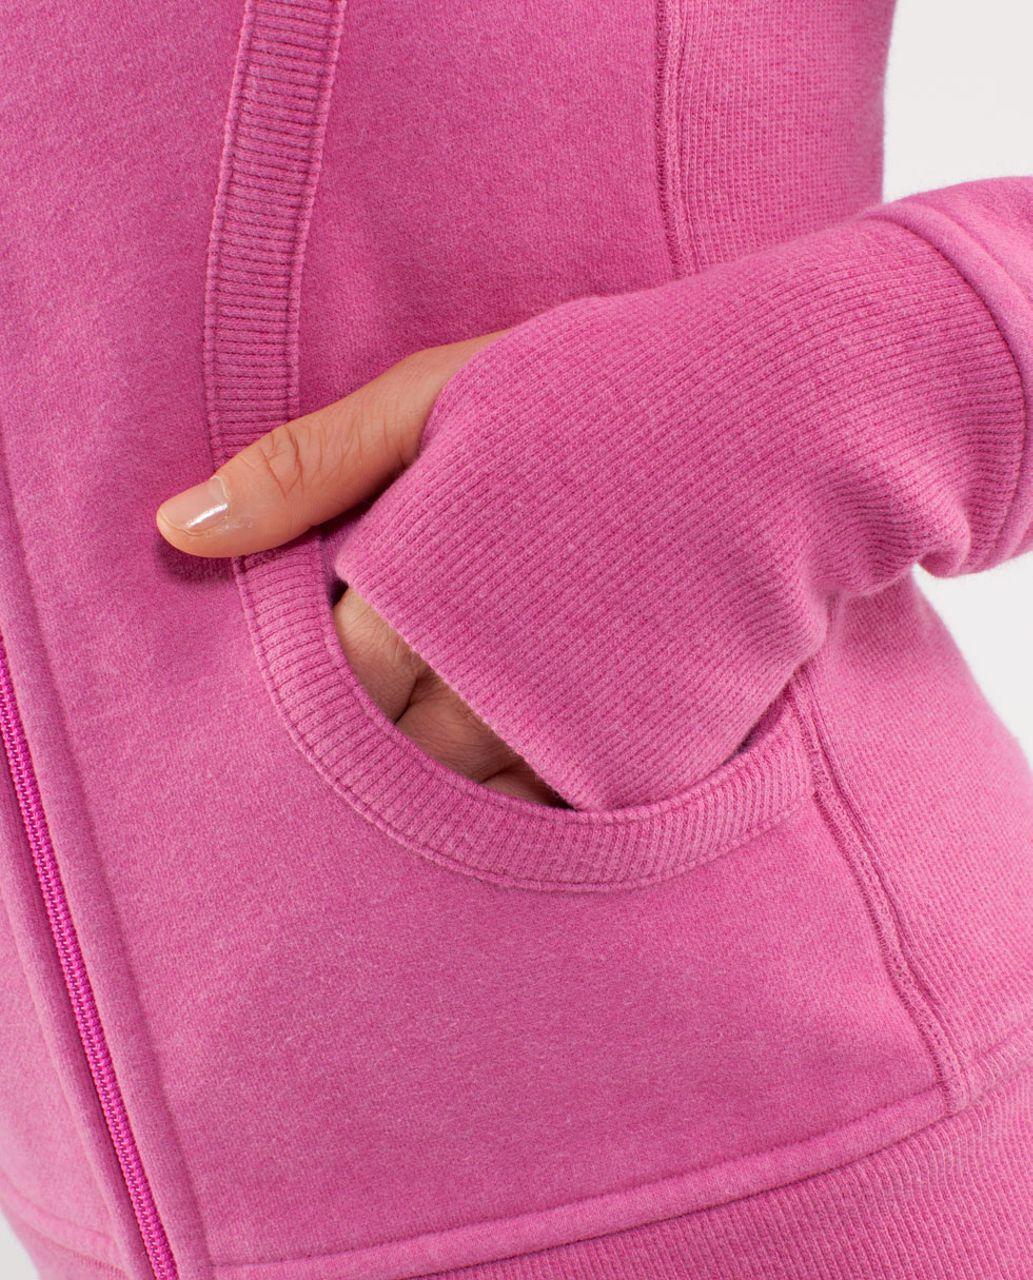 Lululemon Scuba Hoodie - Heathered Paris Pink /  Paris Pink